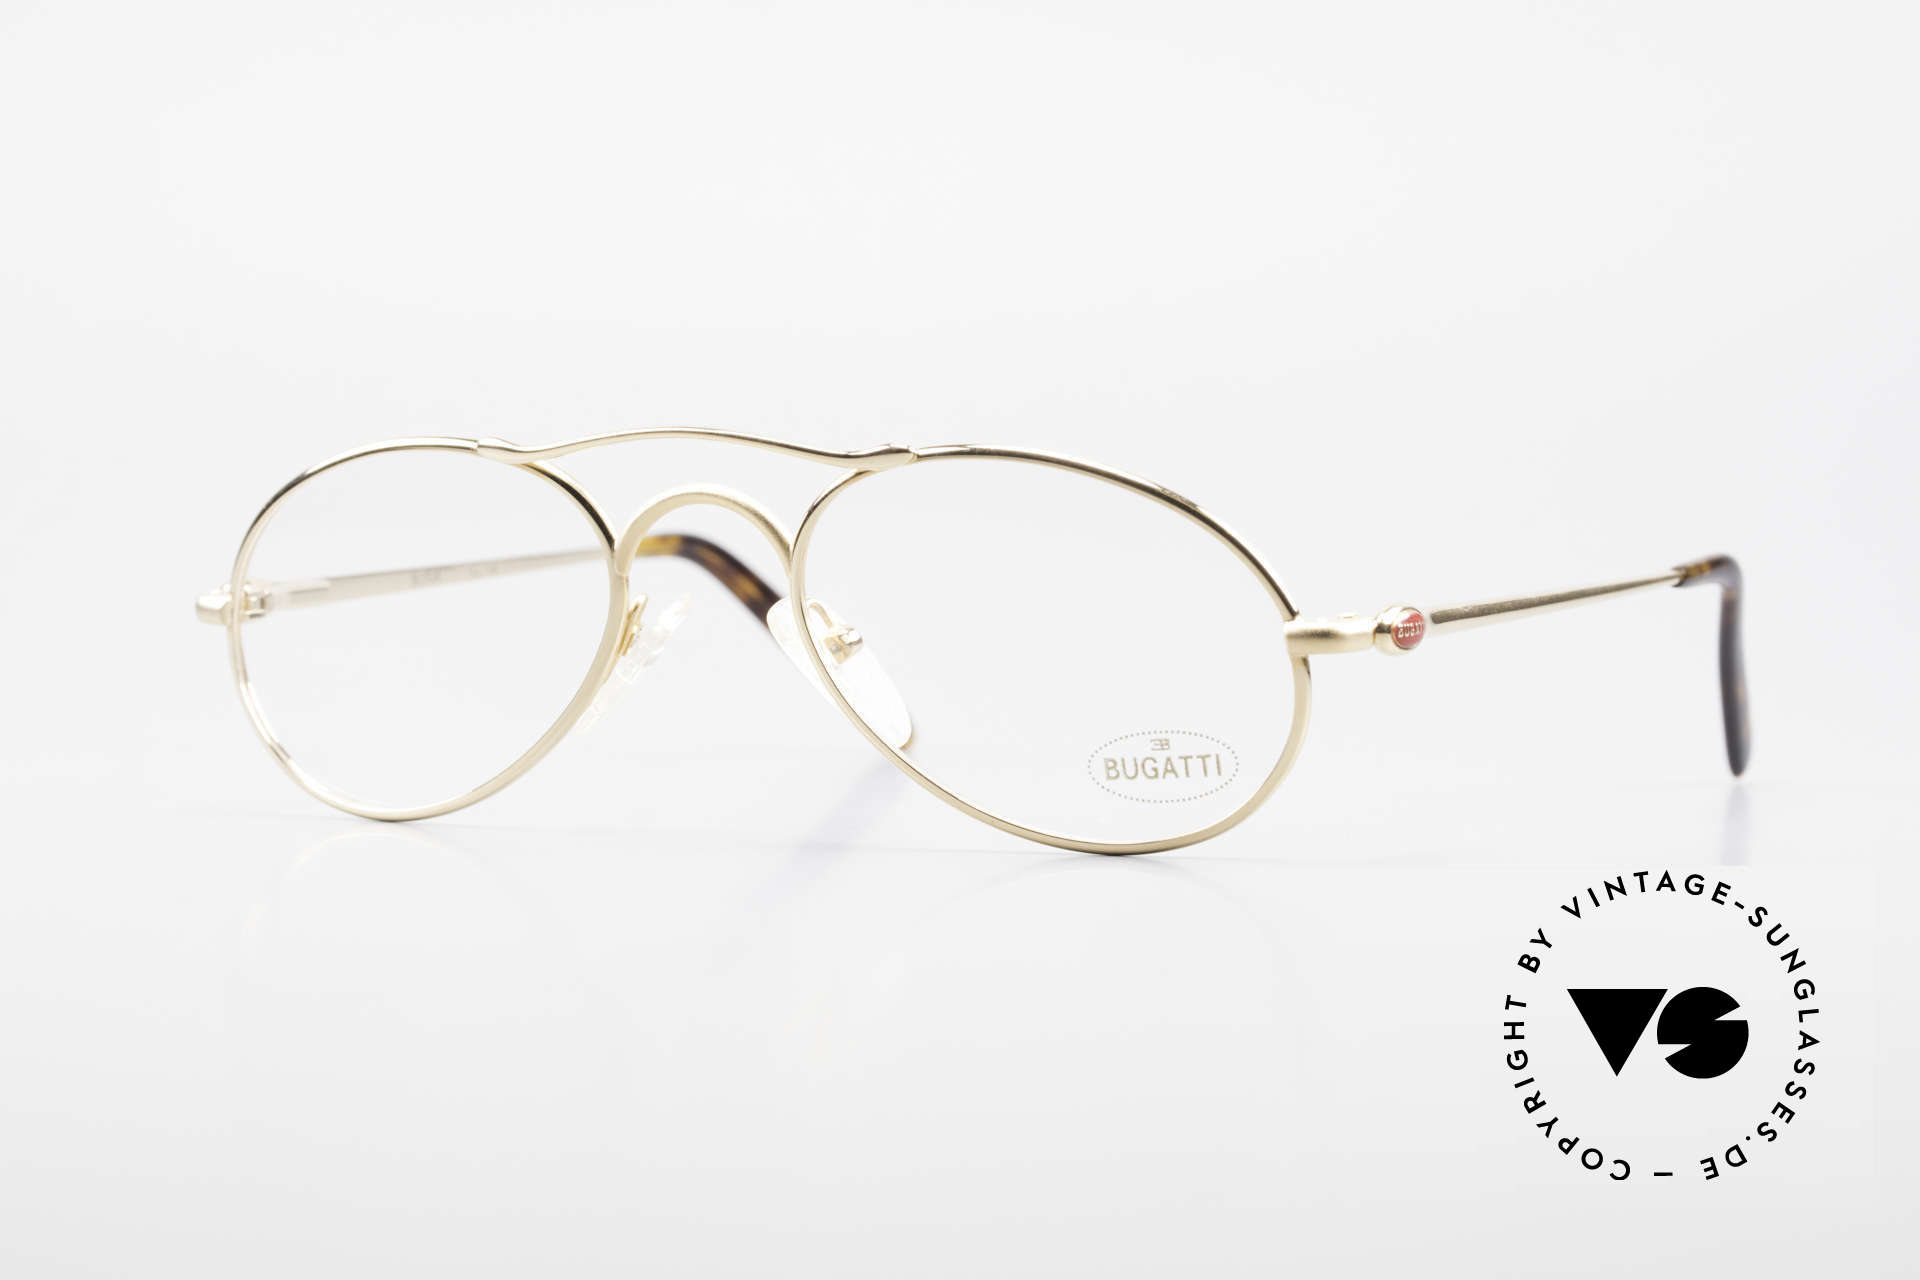 Bugatti 23407 Men's Eyeglasses With Clip On, Size: medium, Made for Men